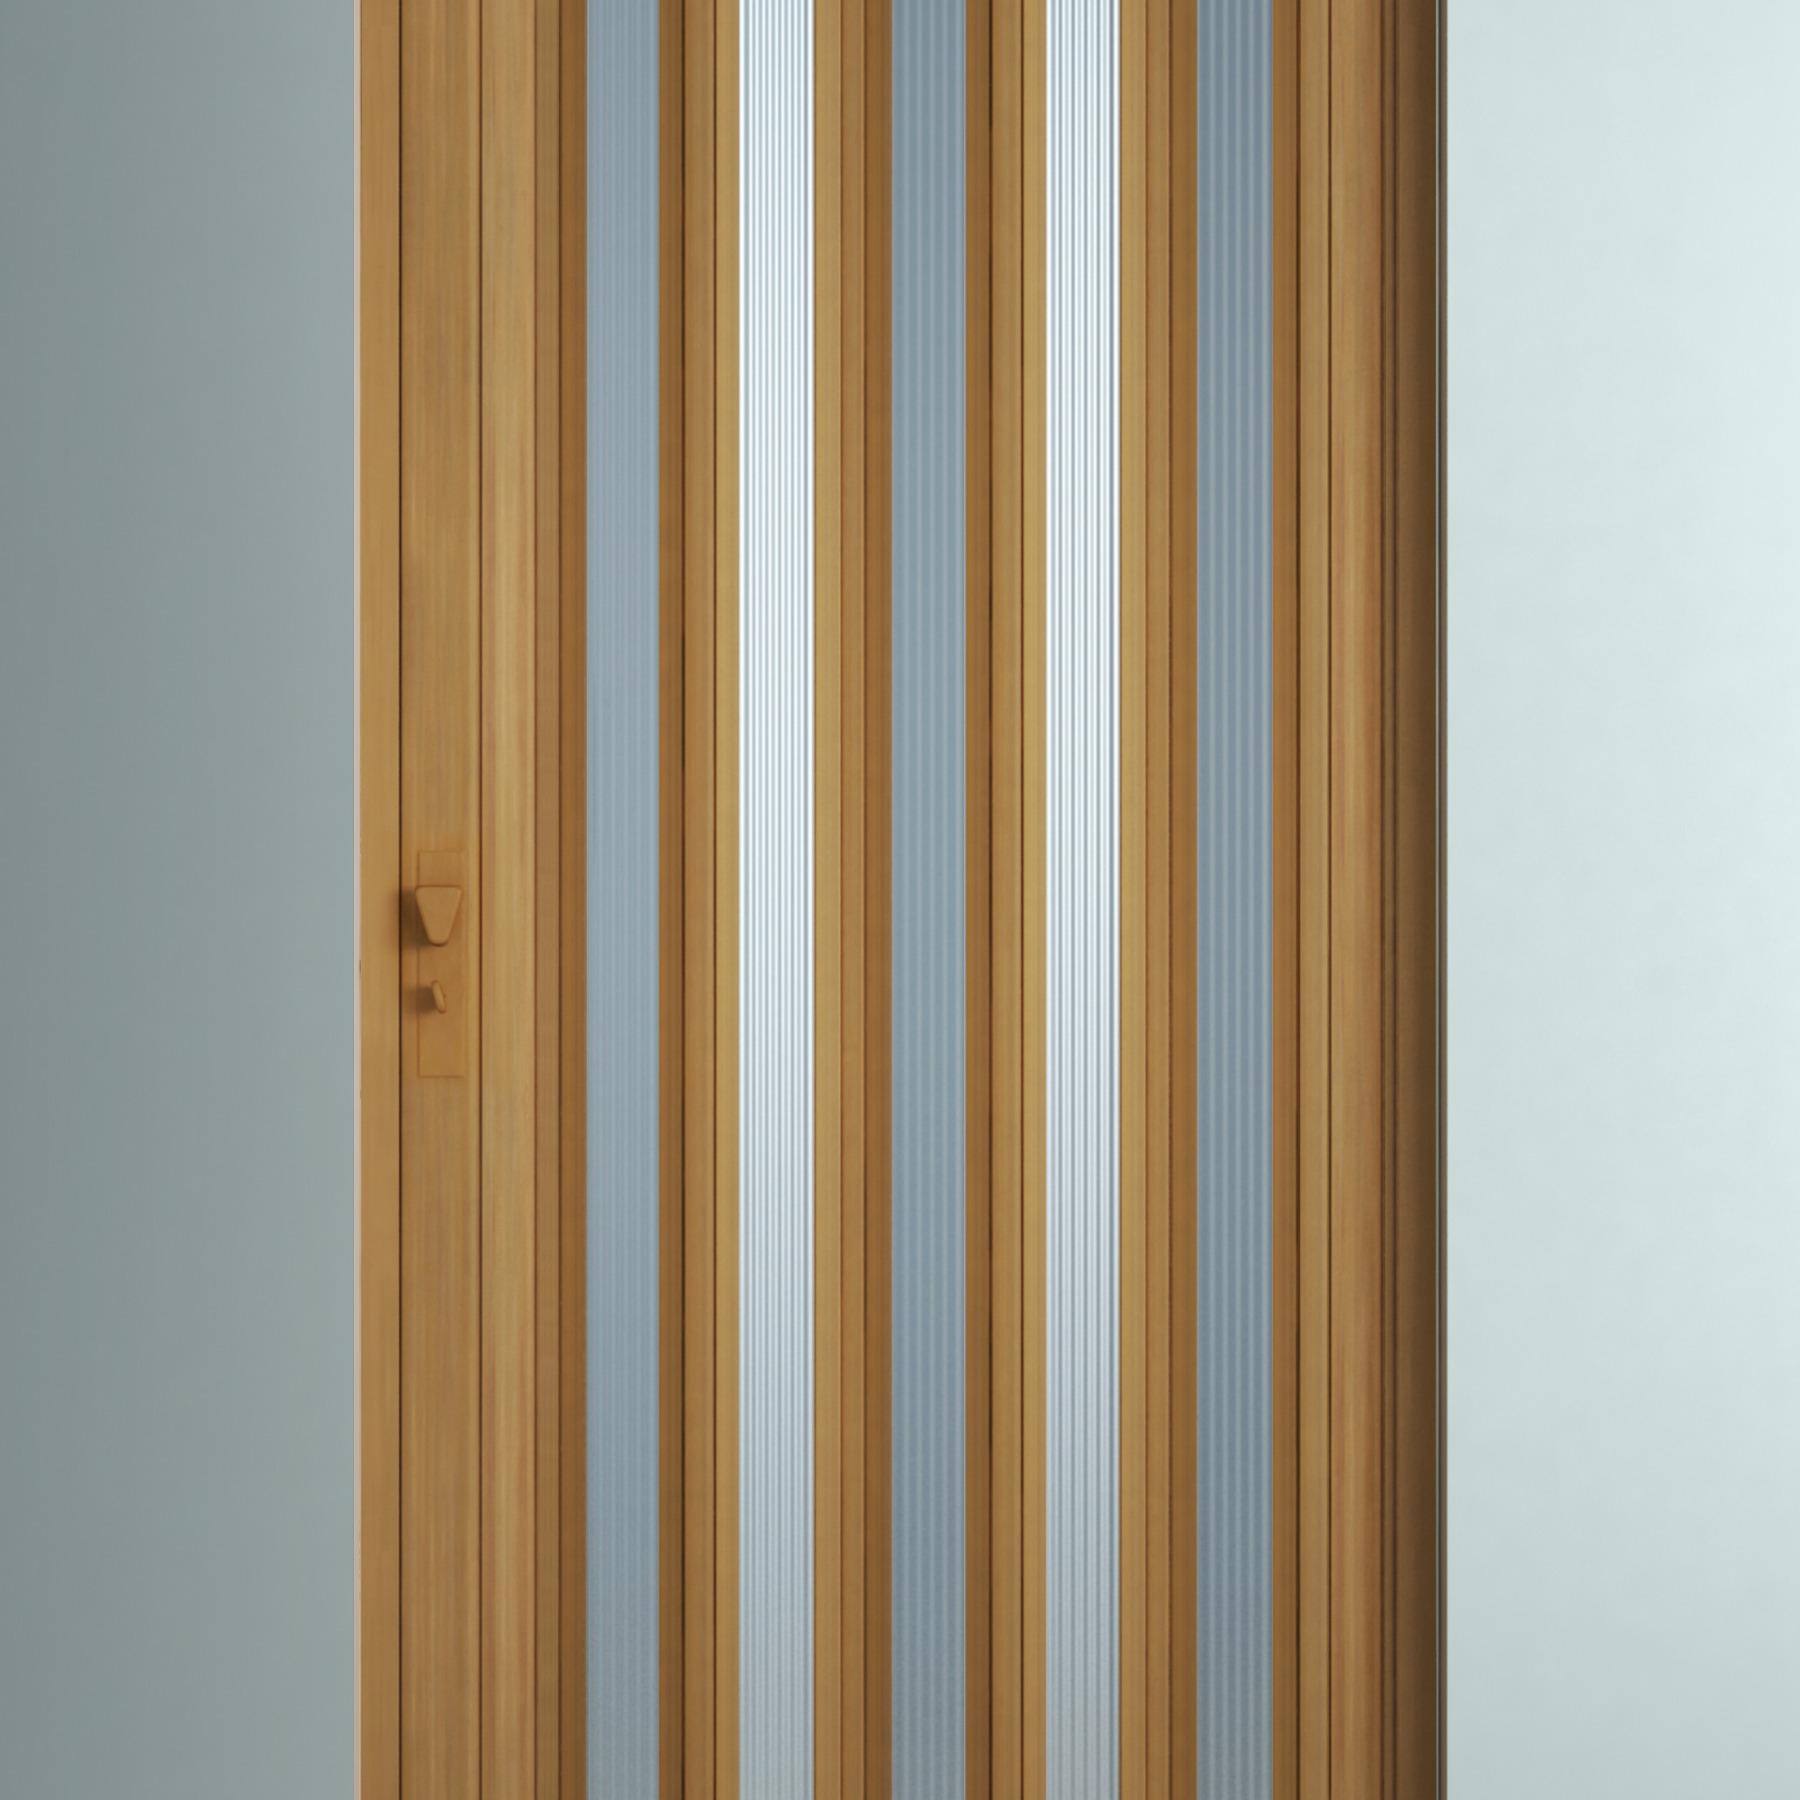 Porta sanfonada decorada pl stico pvc ambos os lados 2 1x0 - Porta pvc leroy merlin ...